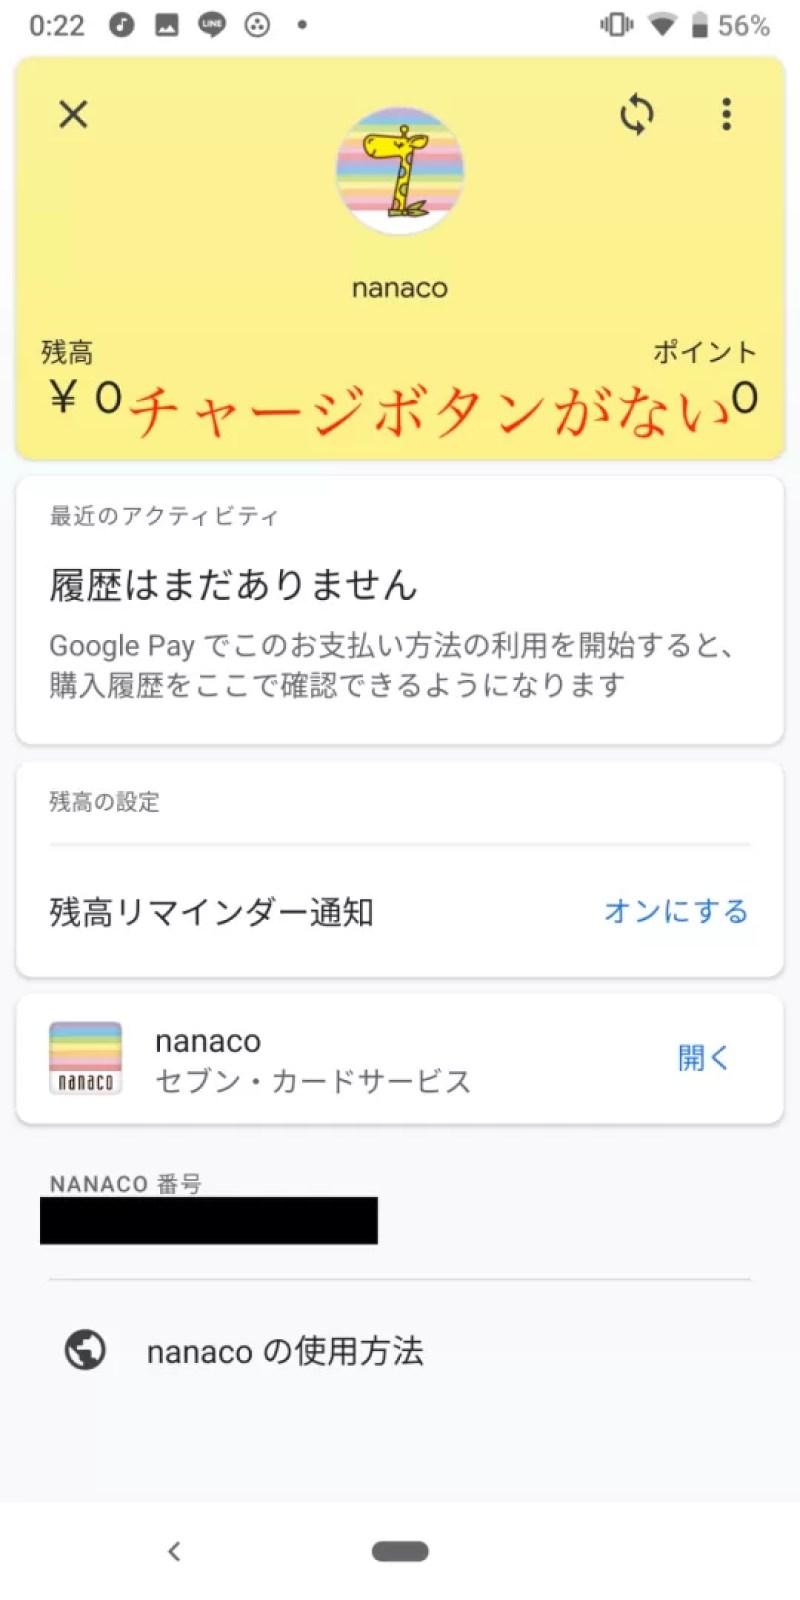 nanacoは別途アプリが必要